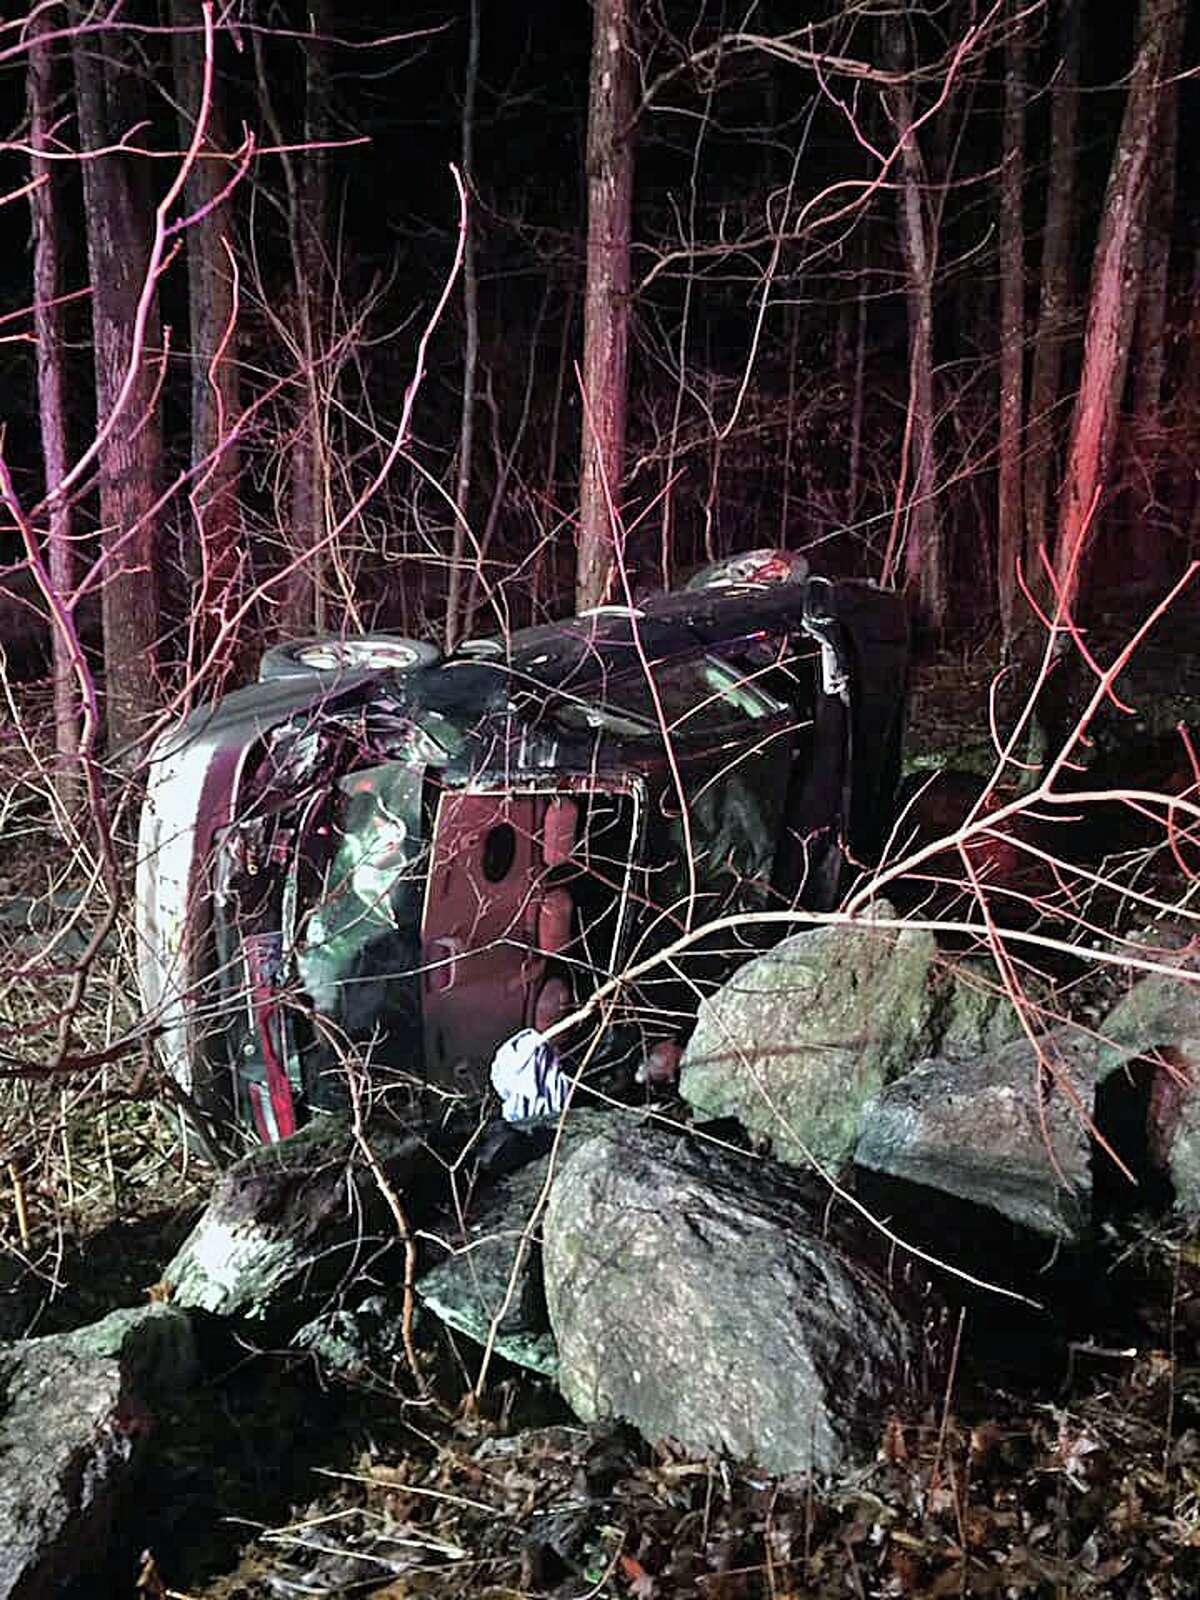 A rollover crash on Hattertown Road in Monroe, Conn., on Thursday, Feb. 13, 2020.